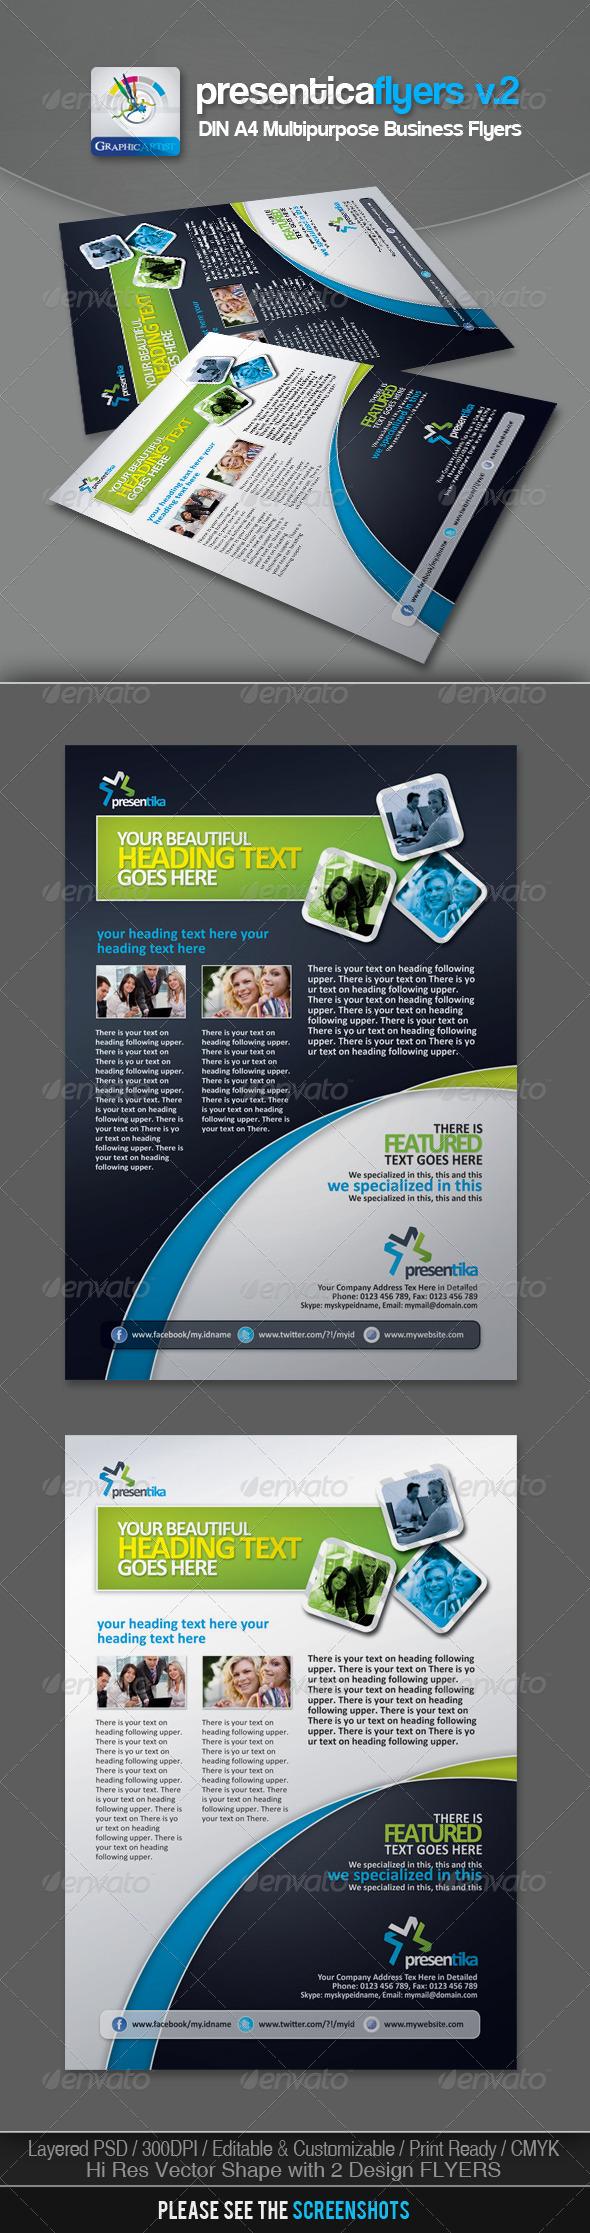 GraphicRiver Presentica Corporate Business Flyers v.2 2986973